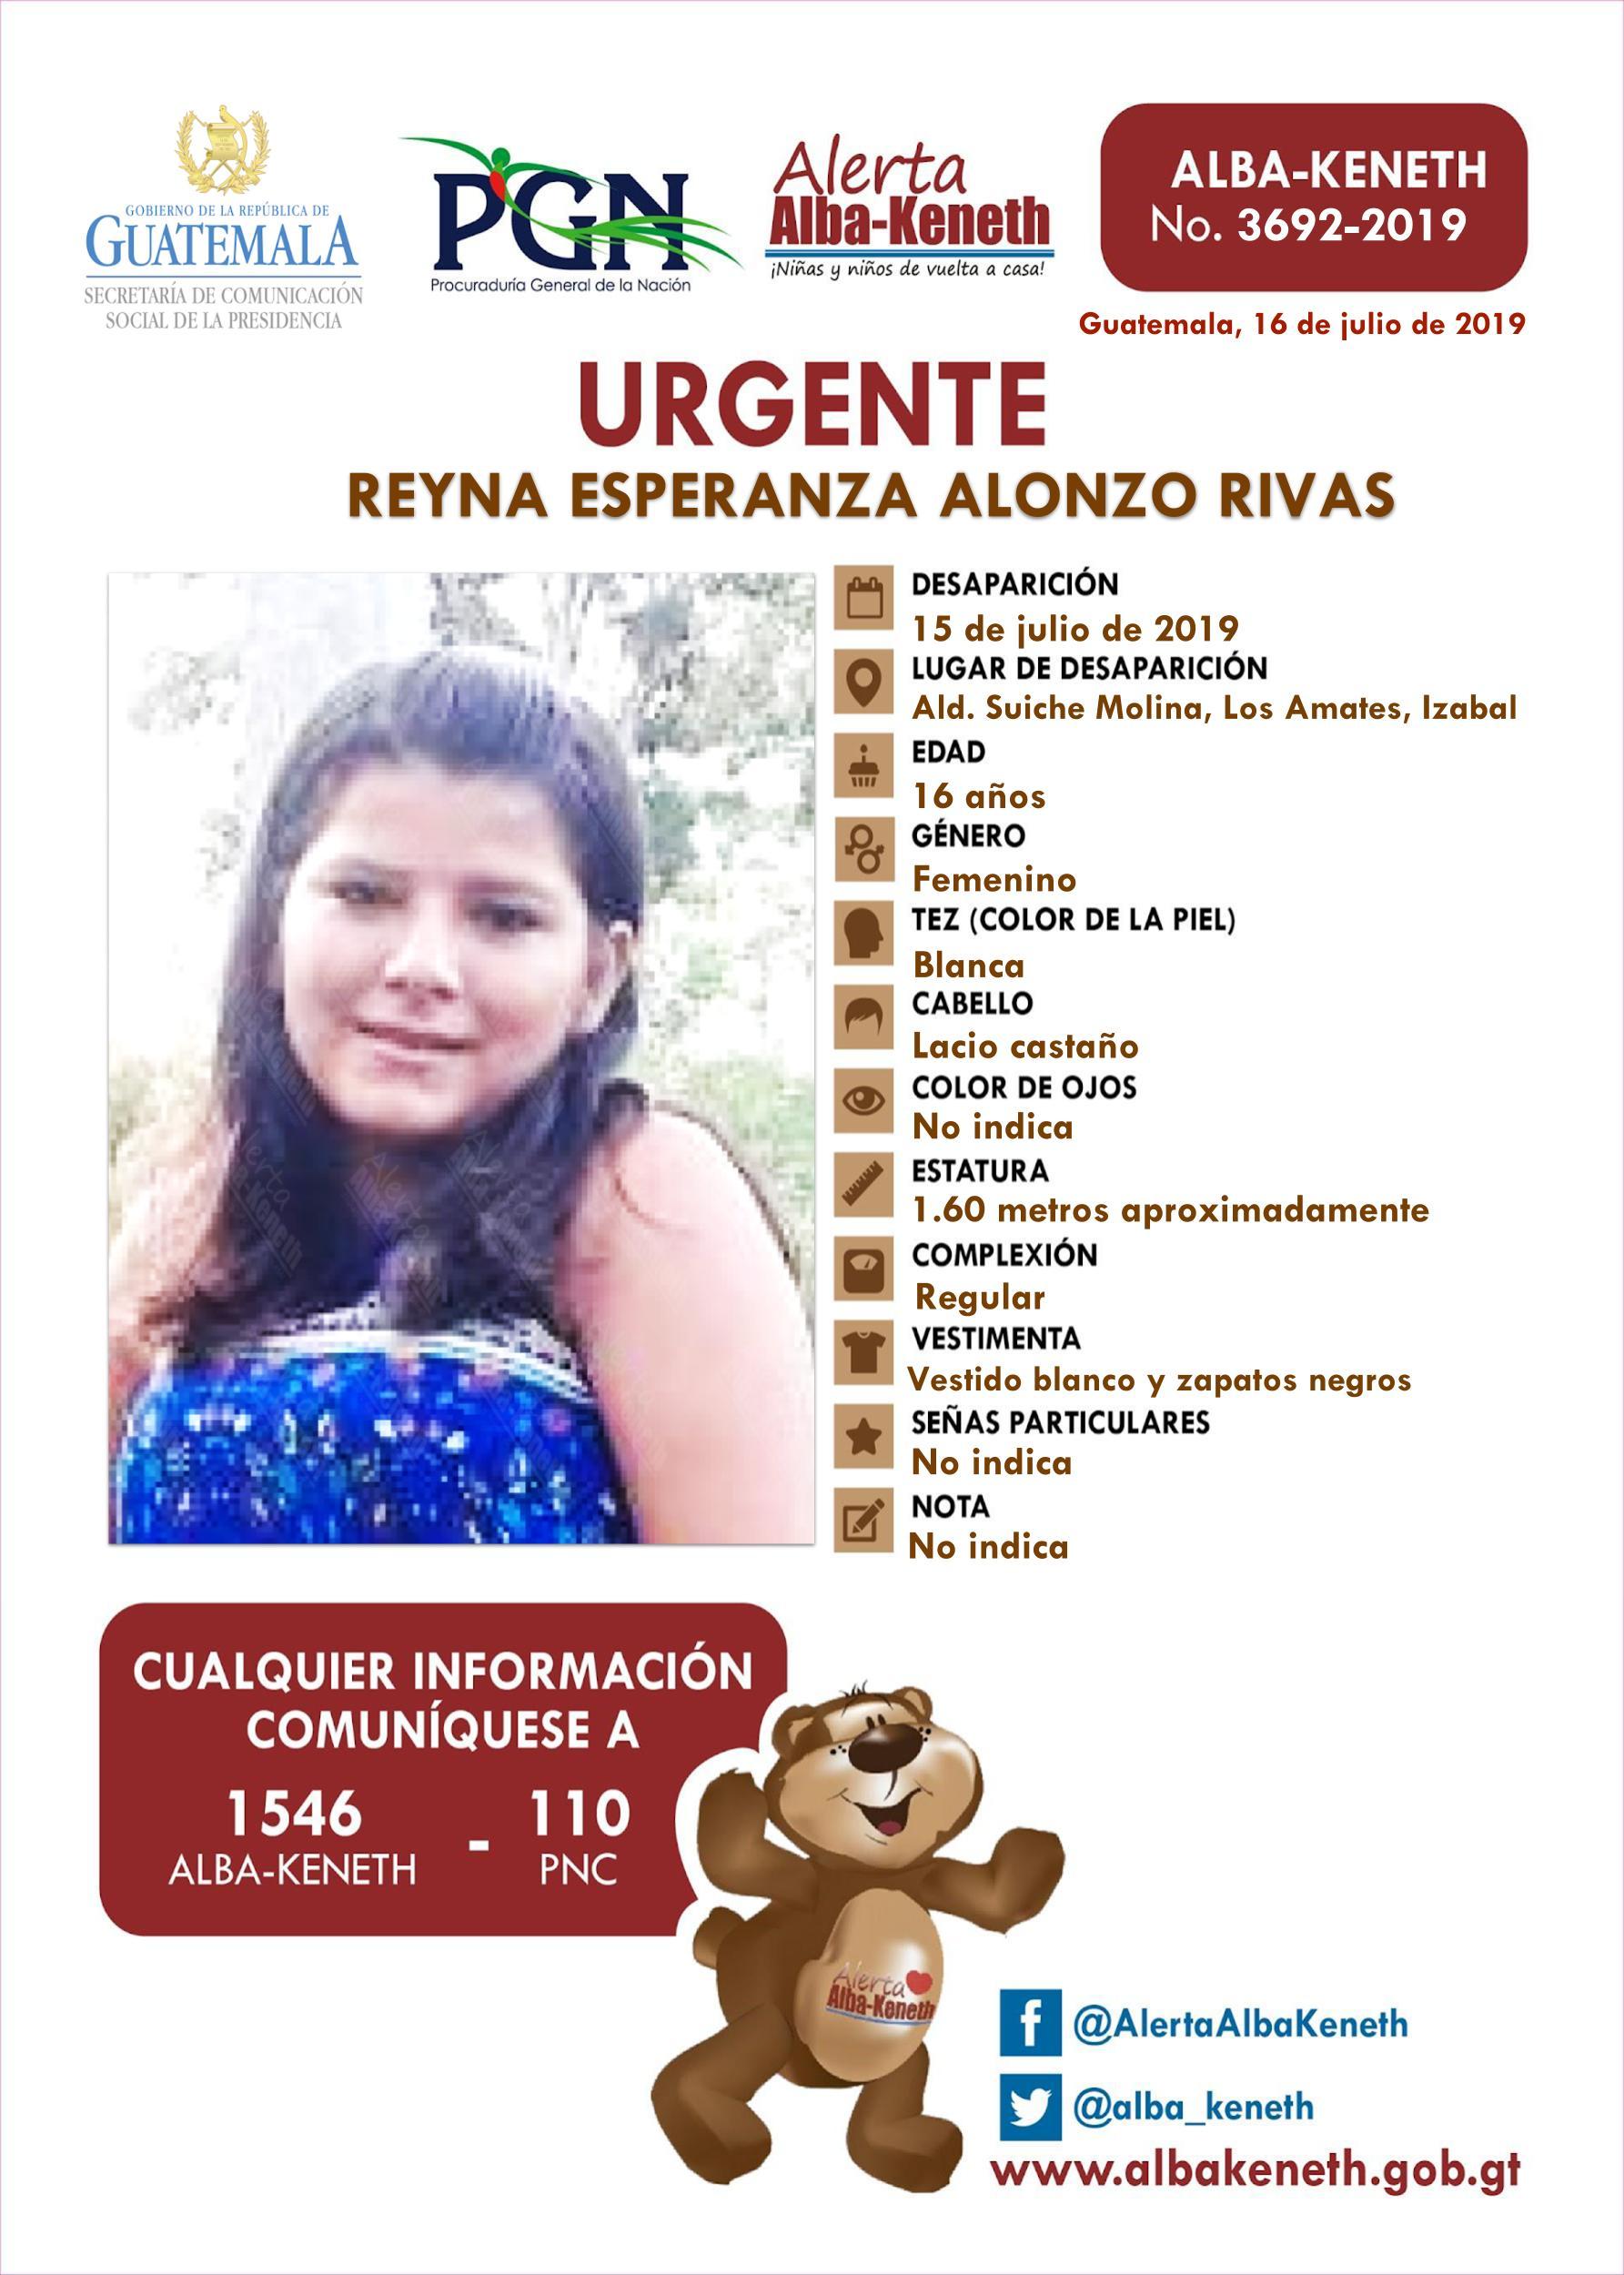 Reyna Esperanza Alonzo Rivas